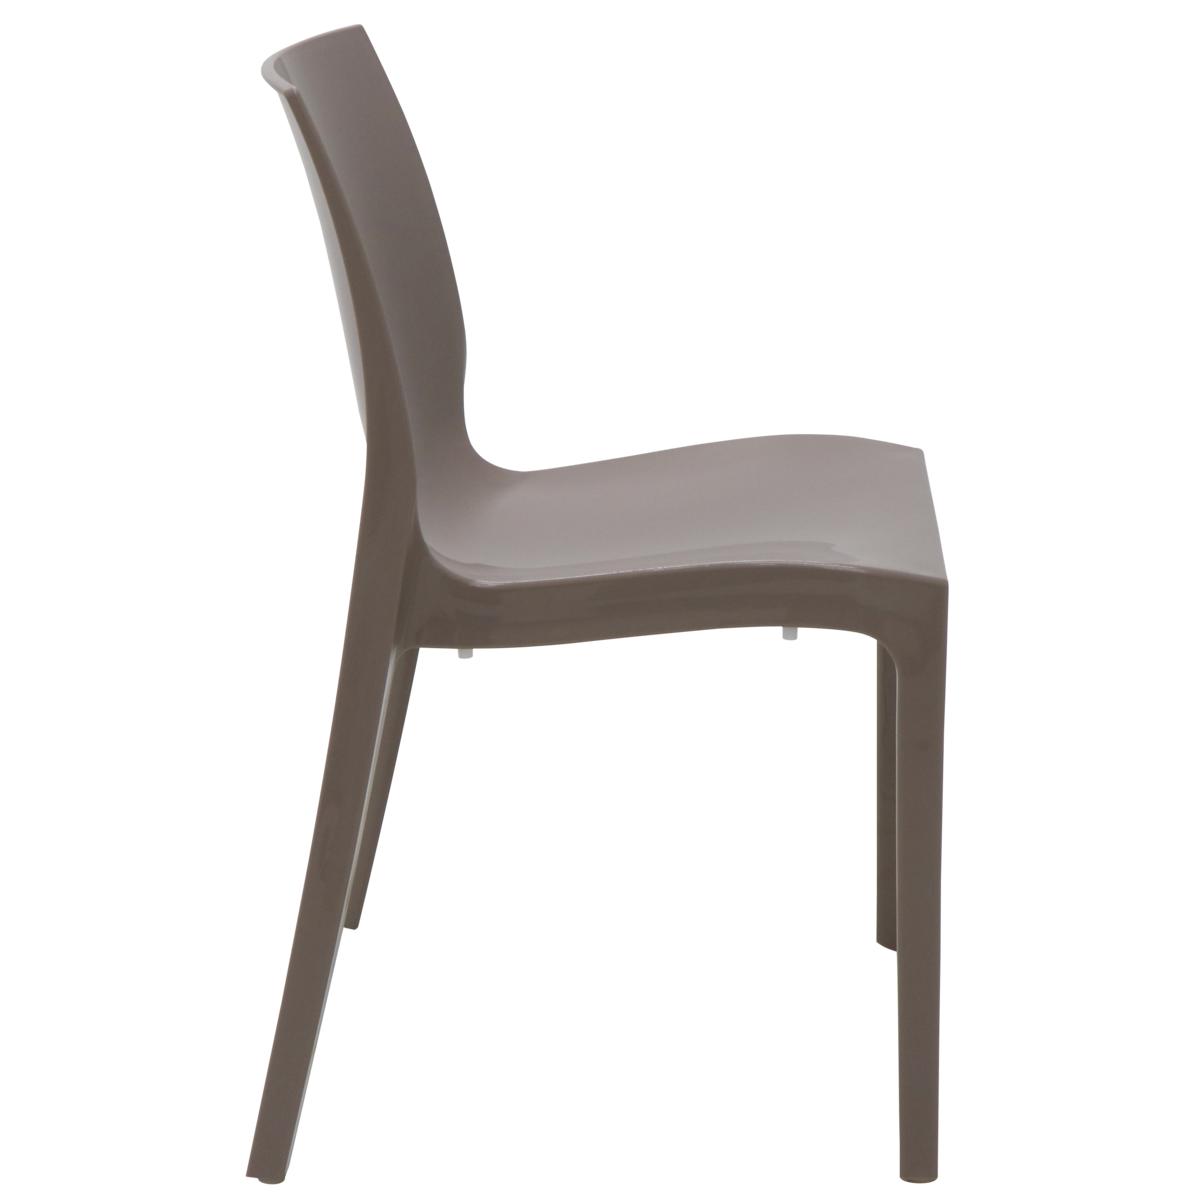 Cadeira Tramontina Alice Camurça 92037/210 1 Peça  - Casa Mattos